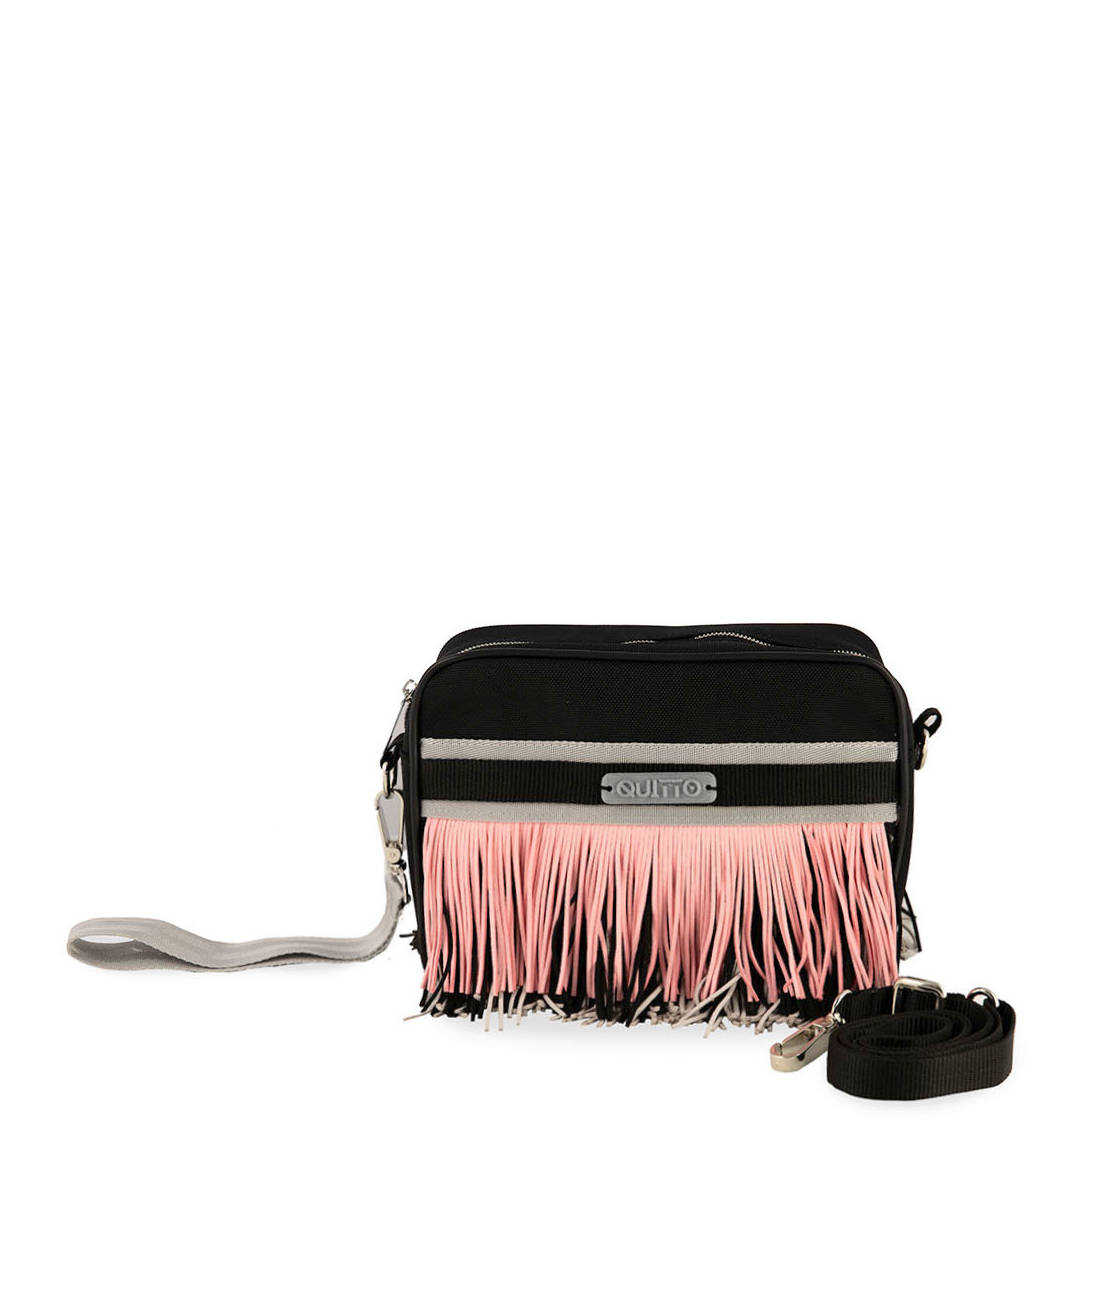 Beauty Bag in Tessuto Tecnico Nero Frange RoBeauty Bag in Tessuto Tecnico Nero Frange  in Alcantara Rosa Grigio Nere Quittobags